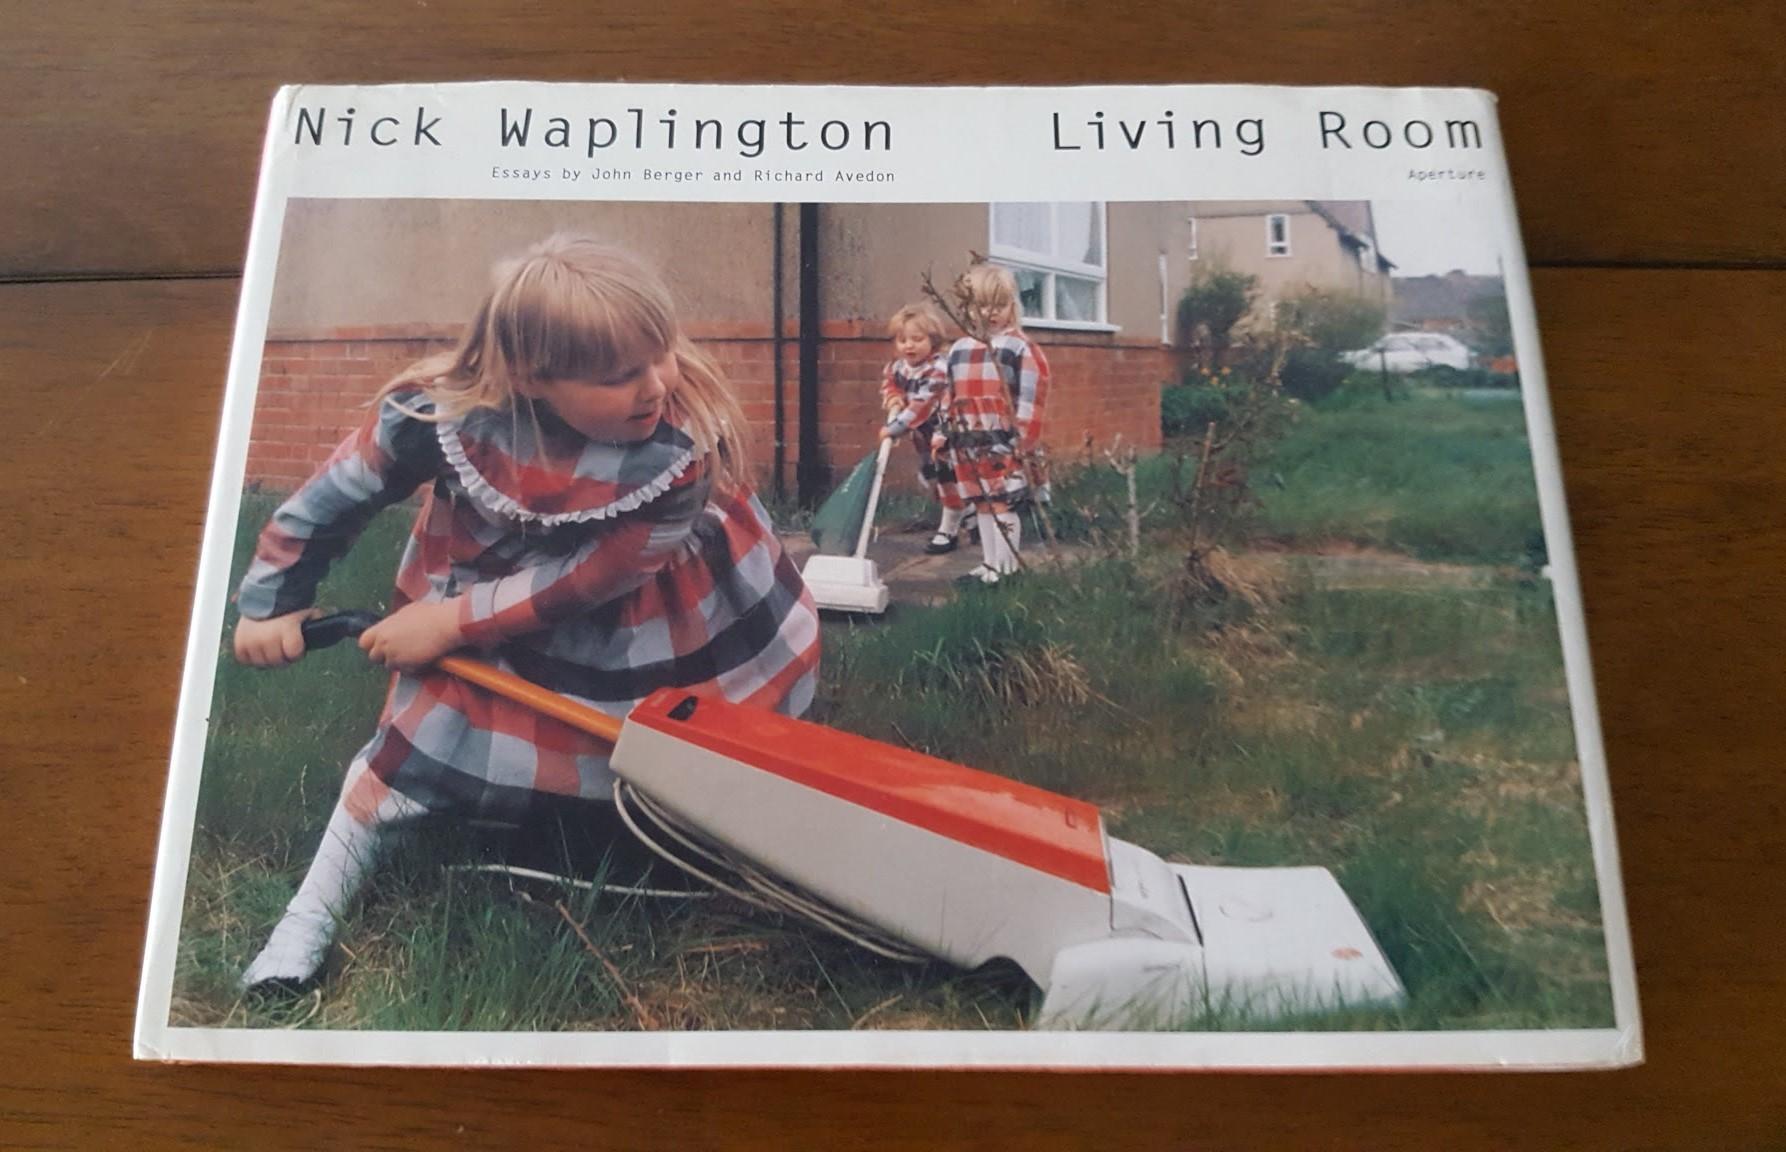 Living Room by Nick Waplington - AbeBooks